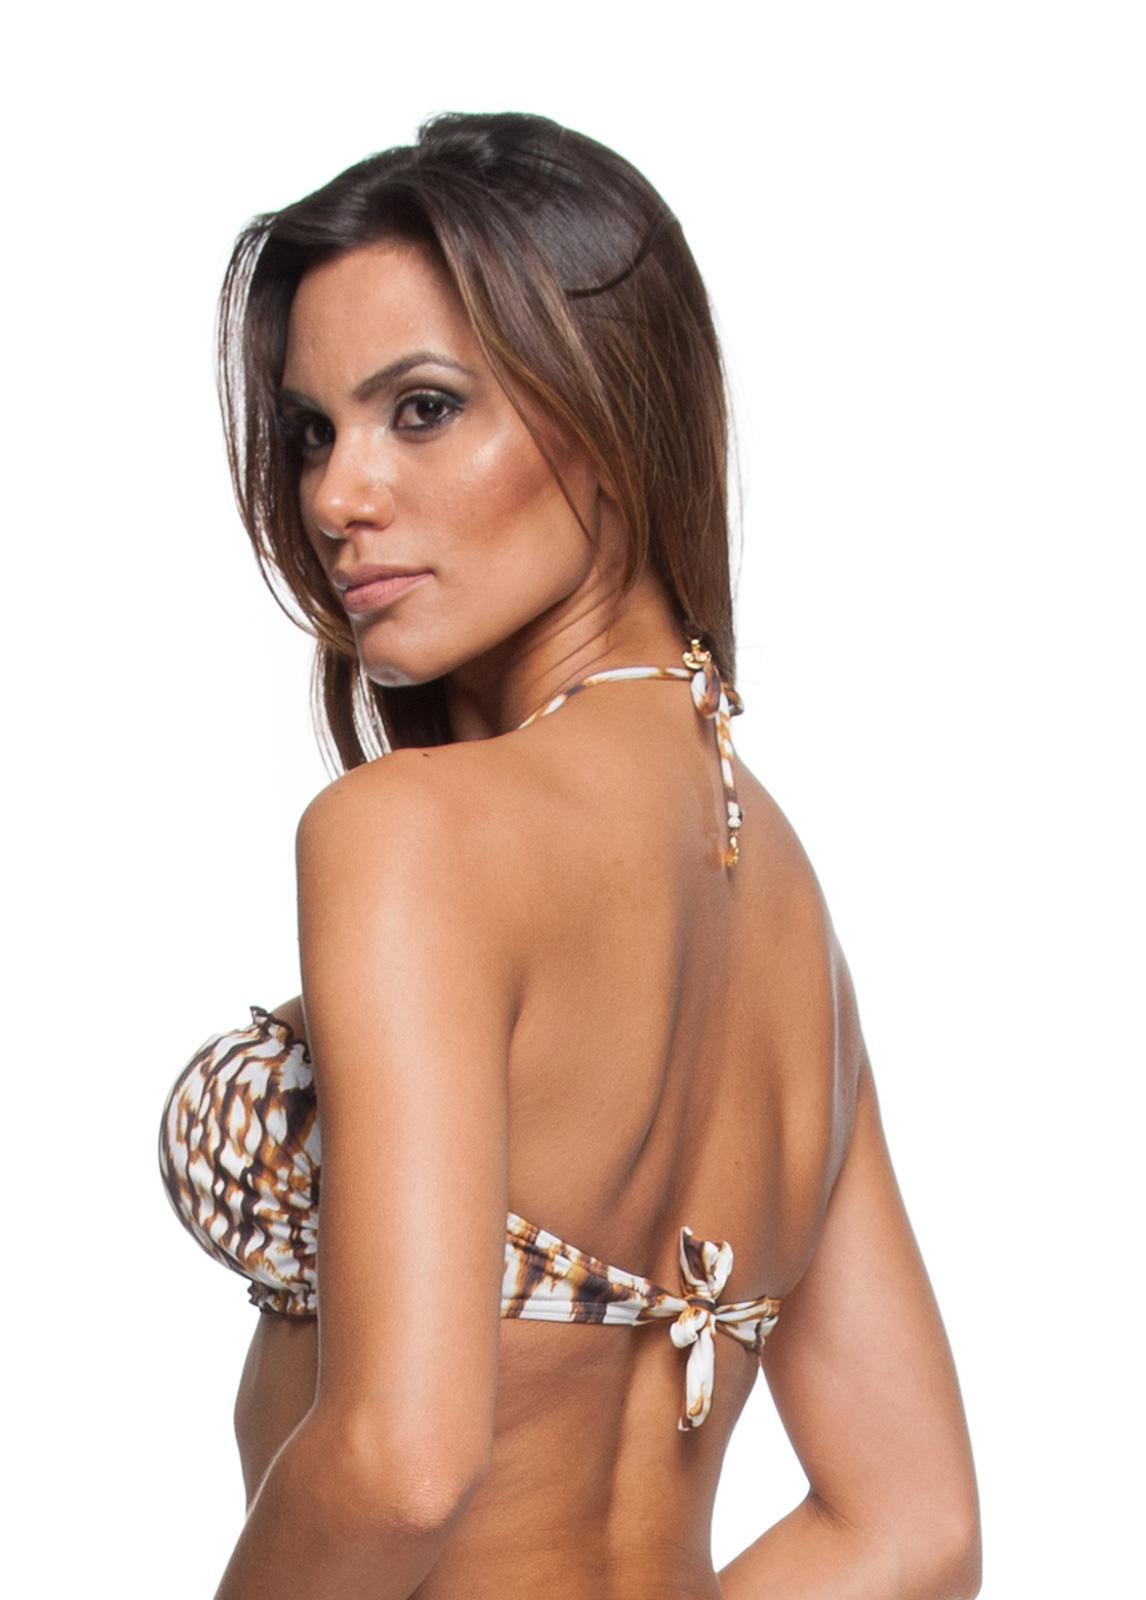 52692ffab591 ... Animal print bandeau bikini top with accessories - SOUTIEN DIVA LEOPARD